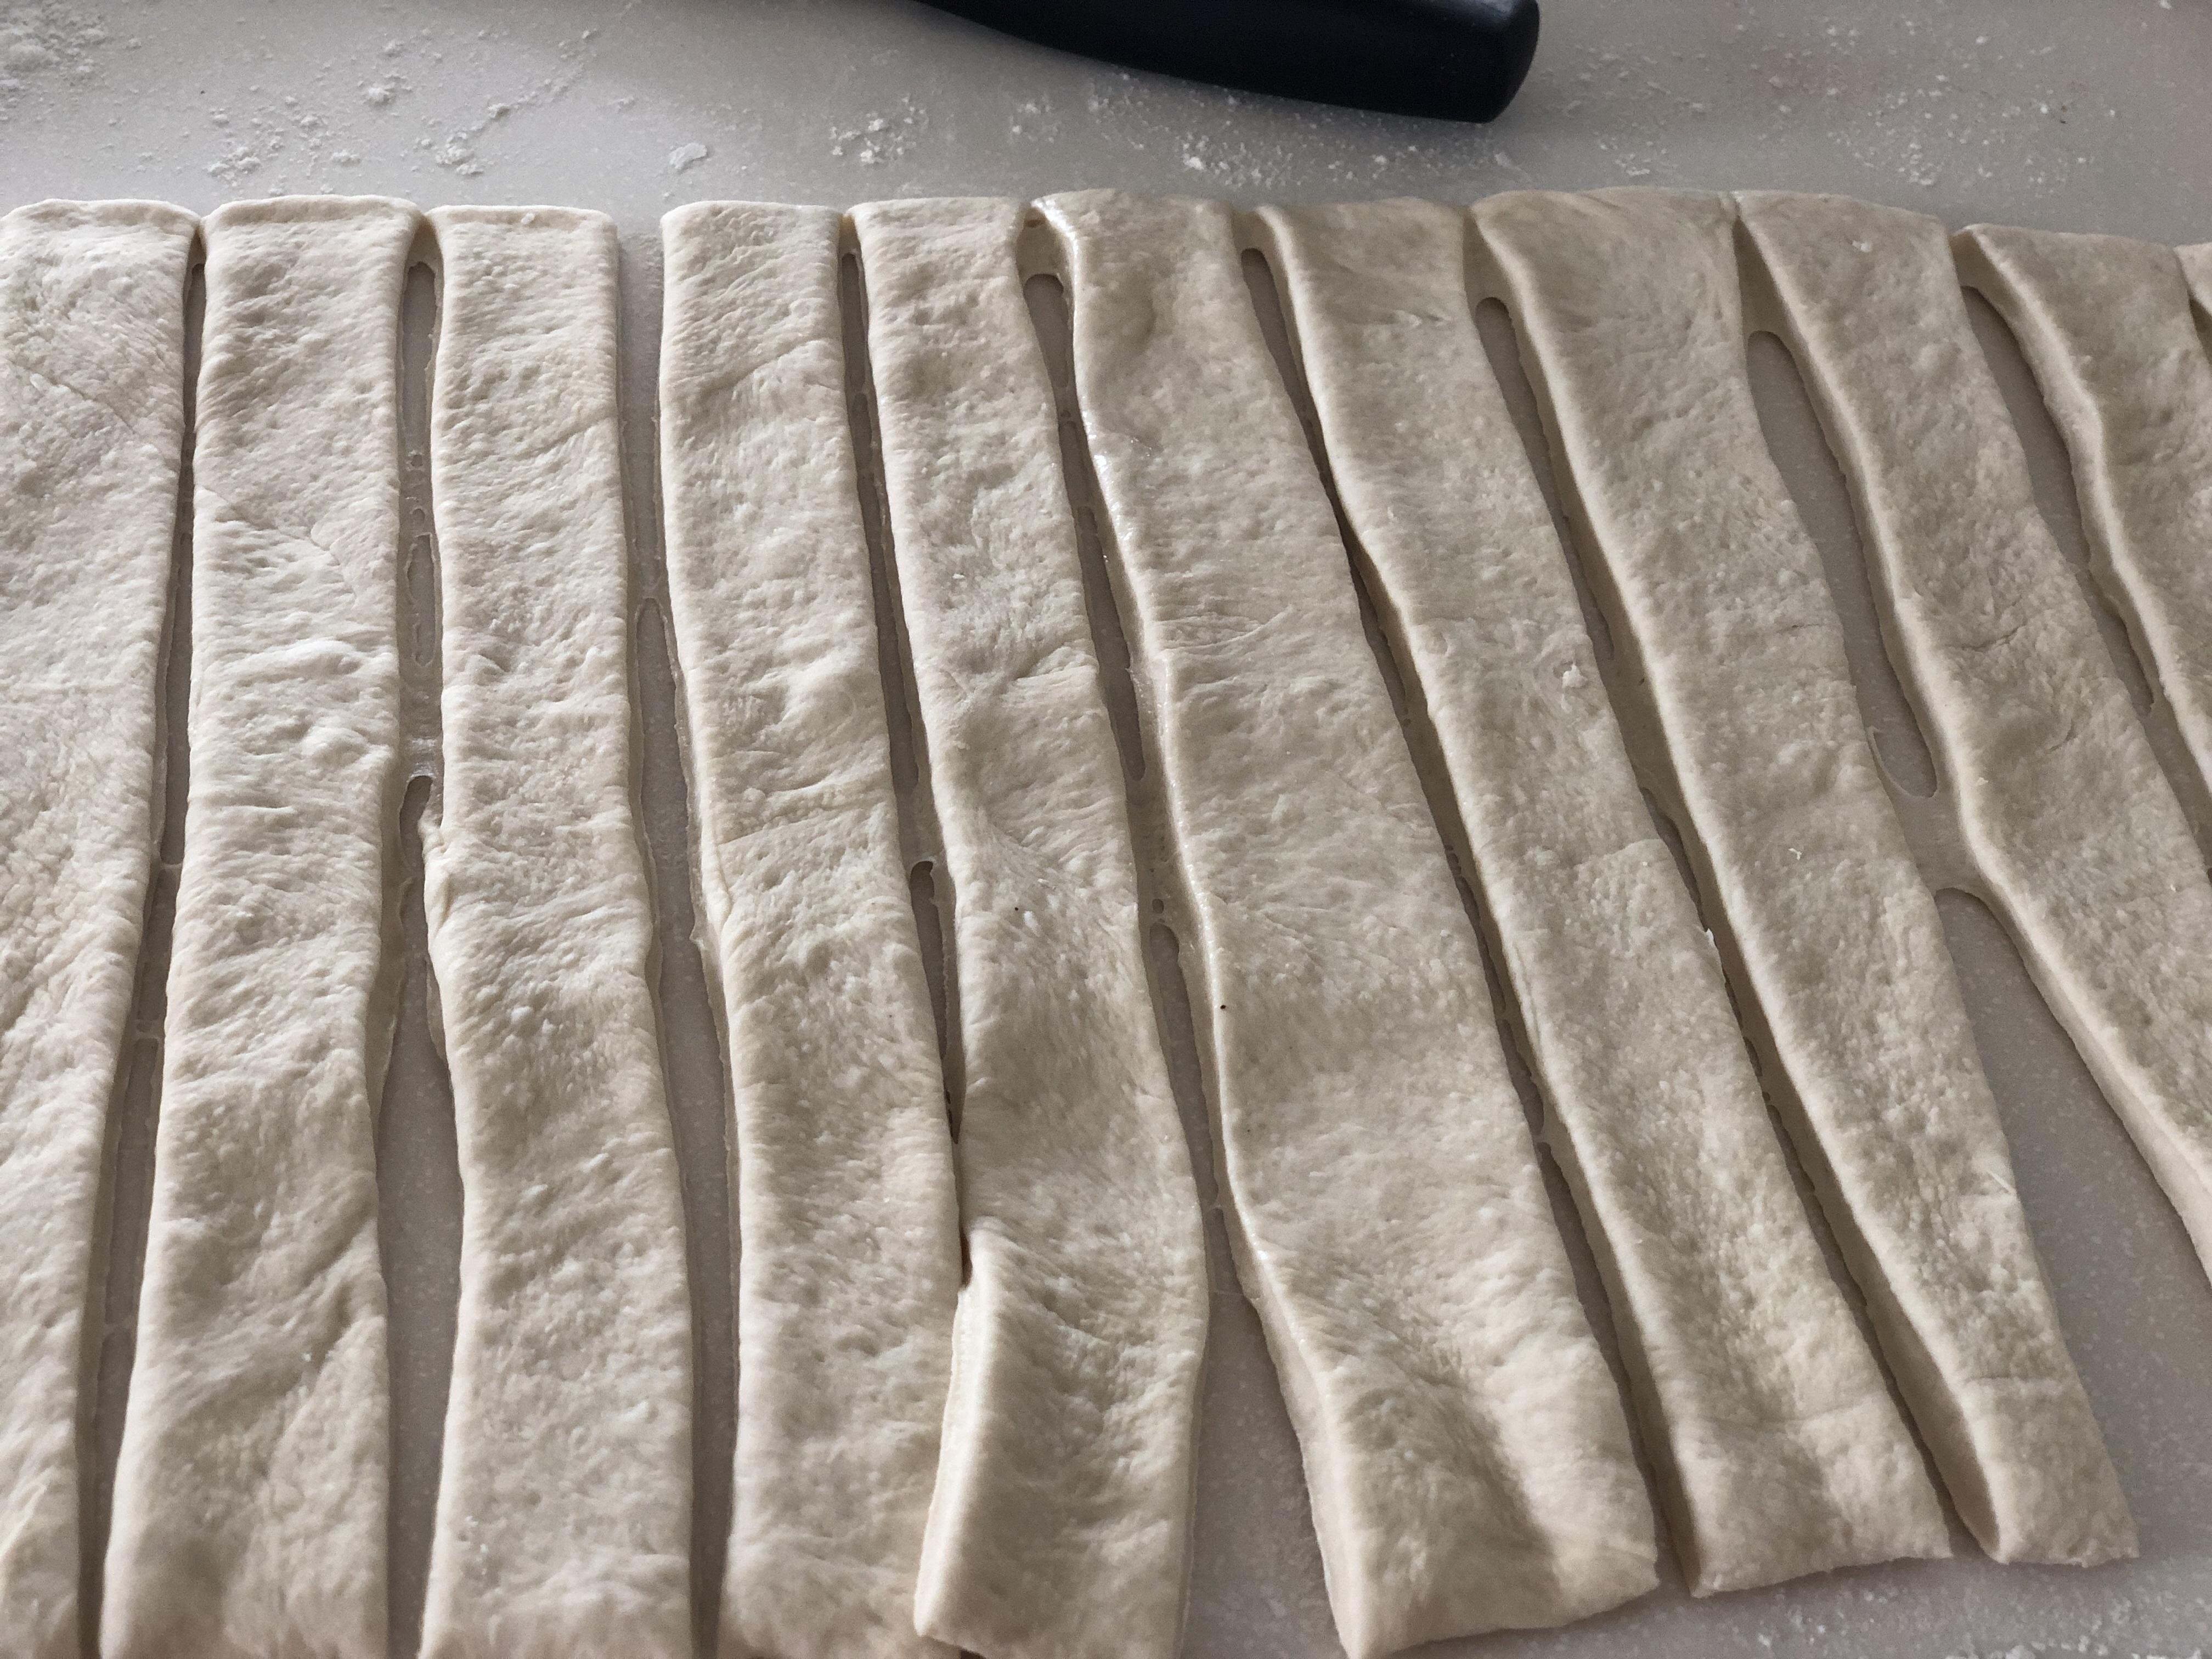 Breadstick dough cut into strips to make breadsticks